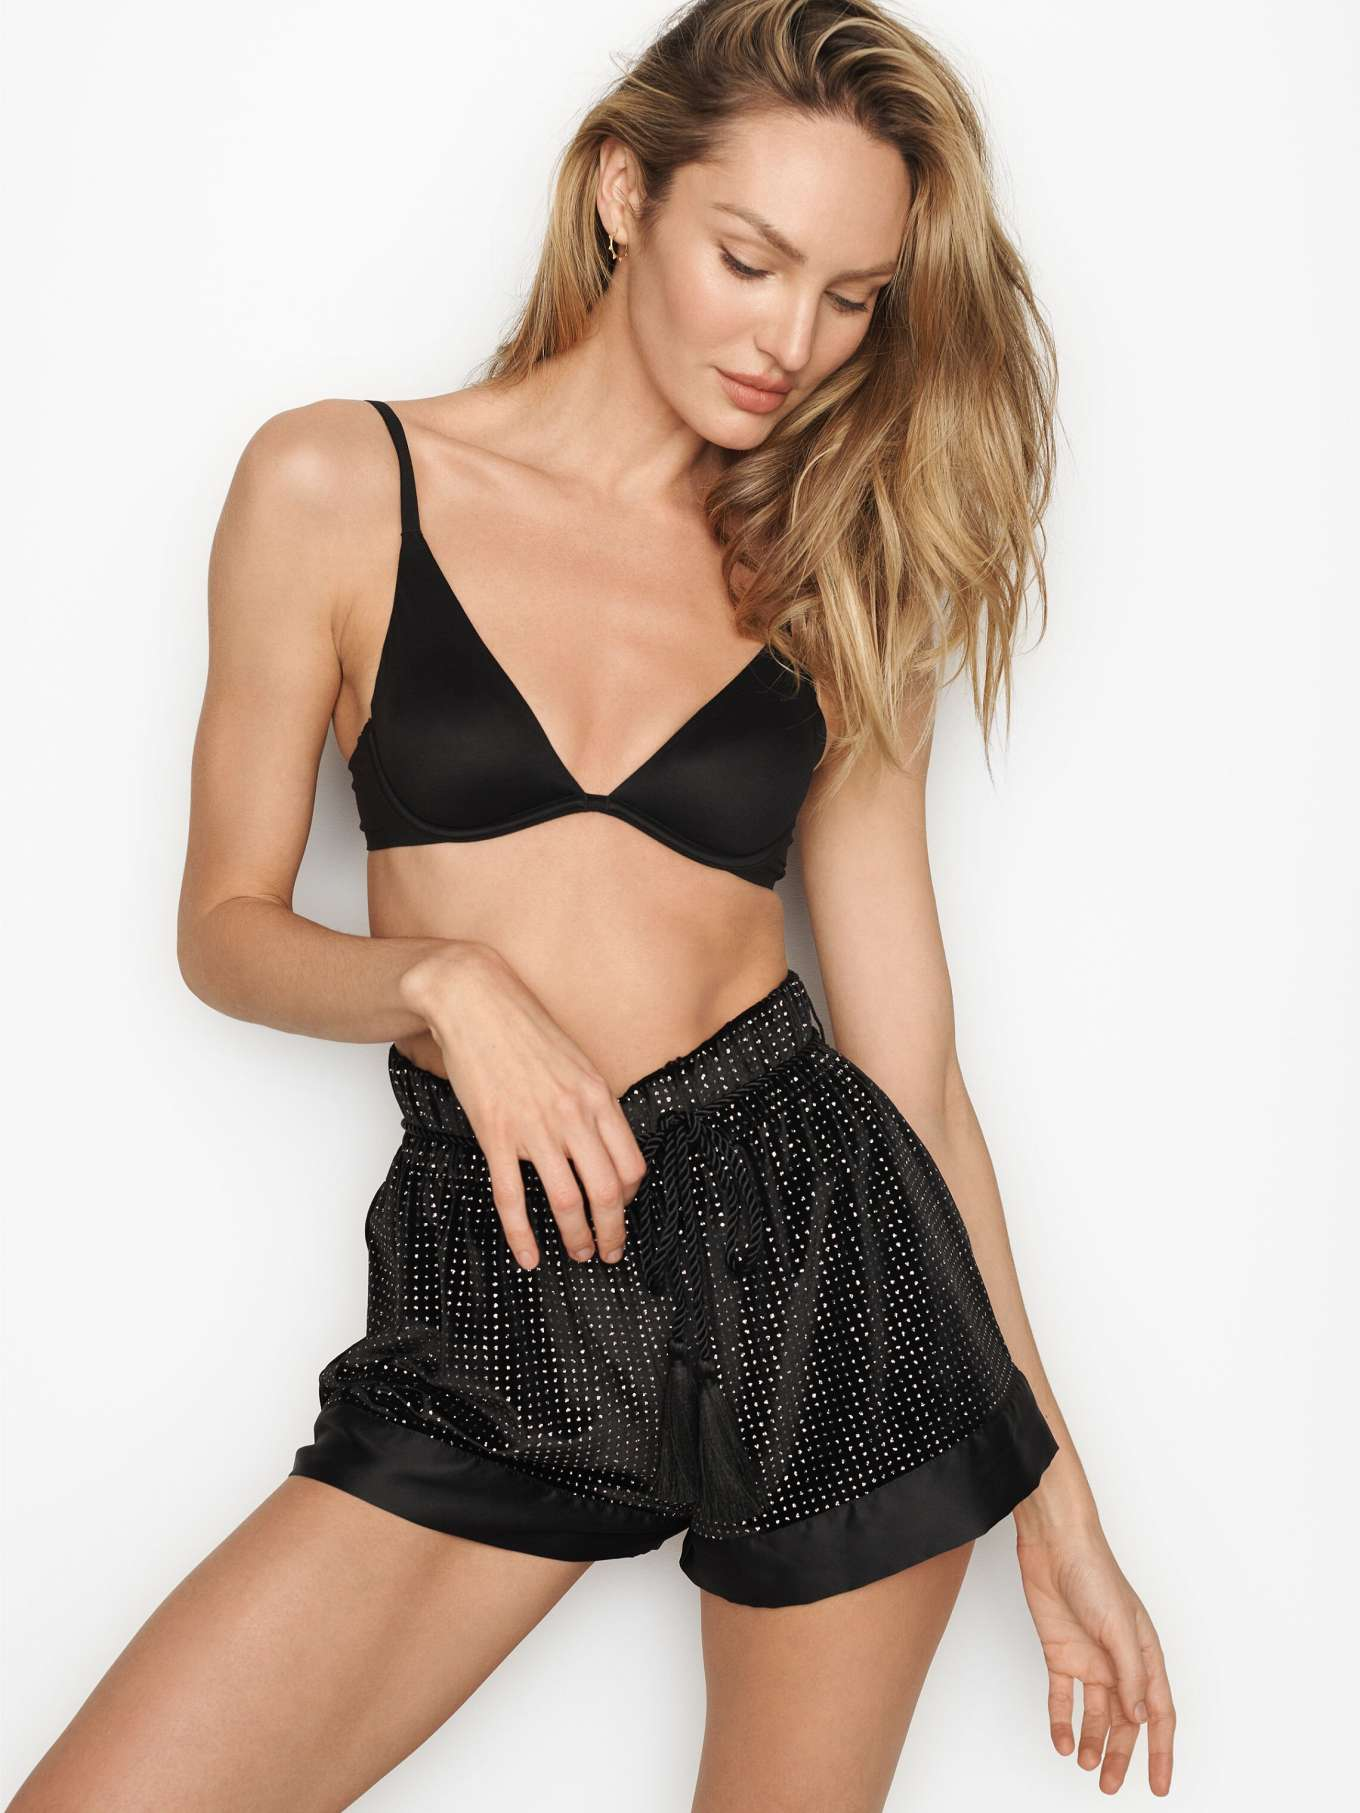 Candice Swanepoel 2019 : Candice Swanepoel – Victorias Secret (December 2019)-01